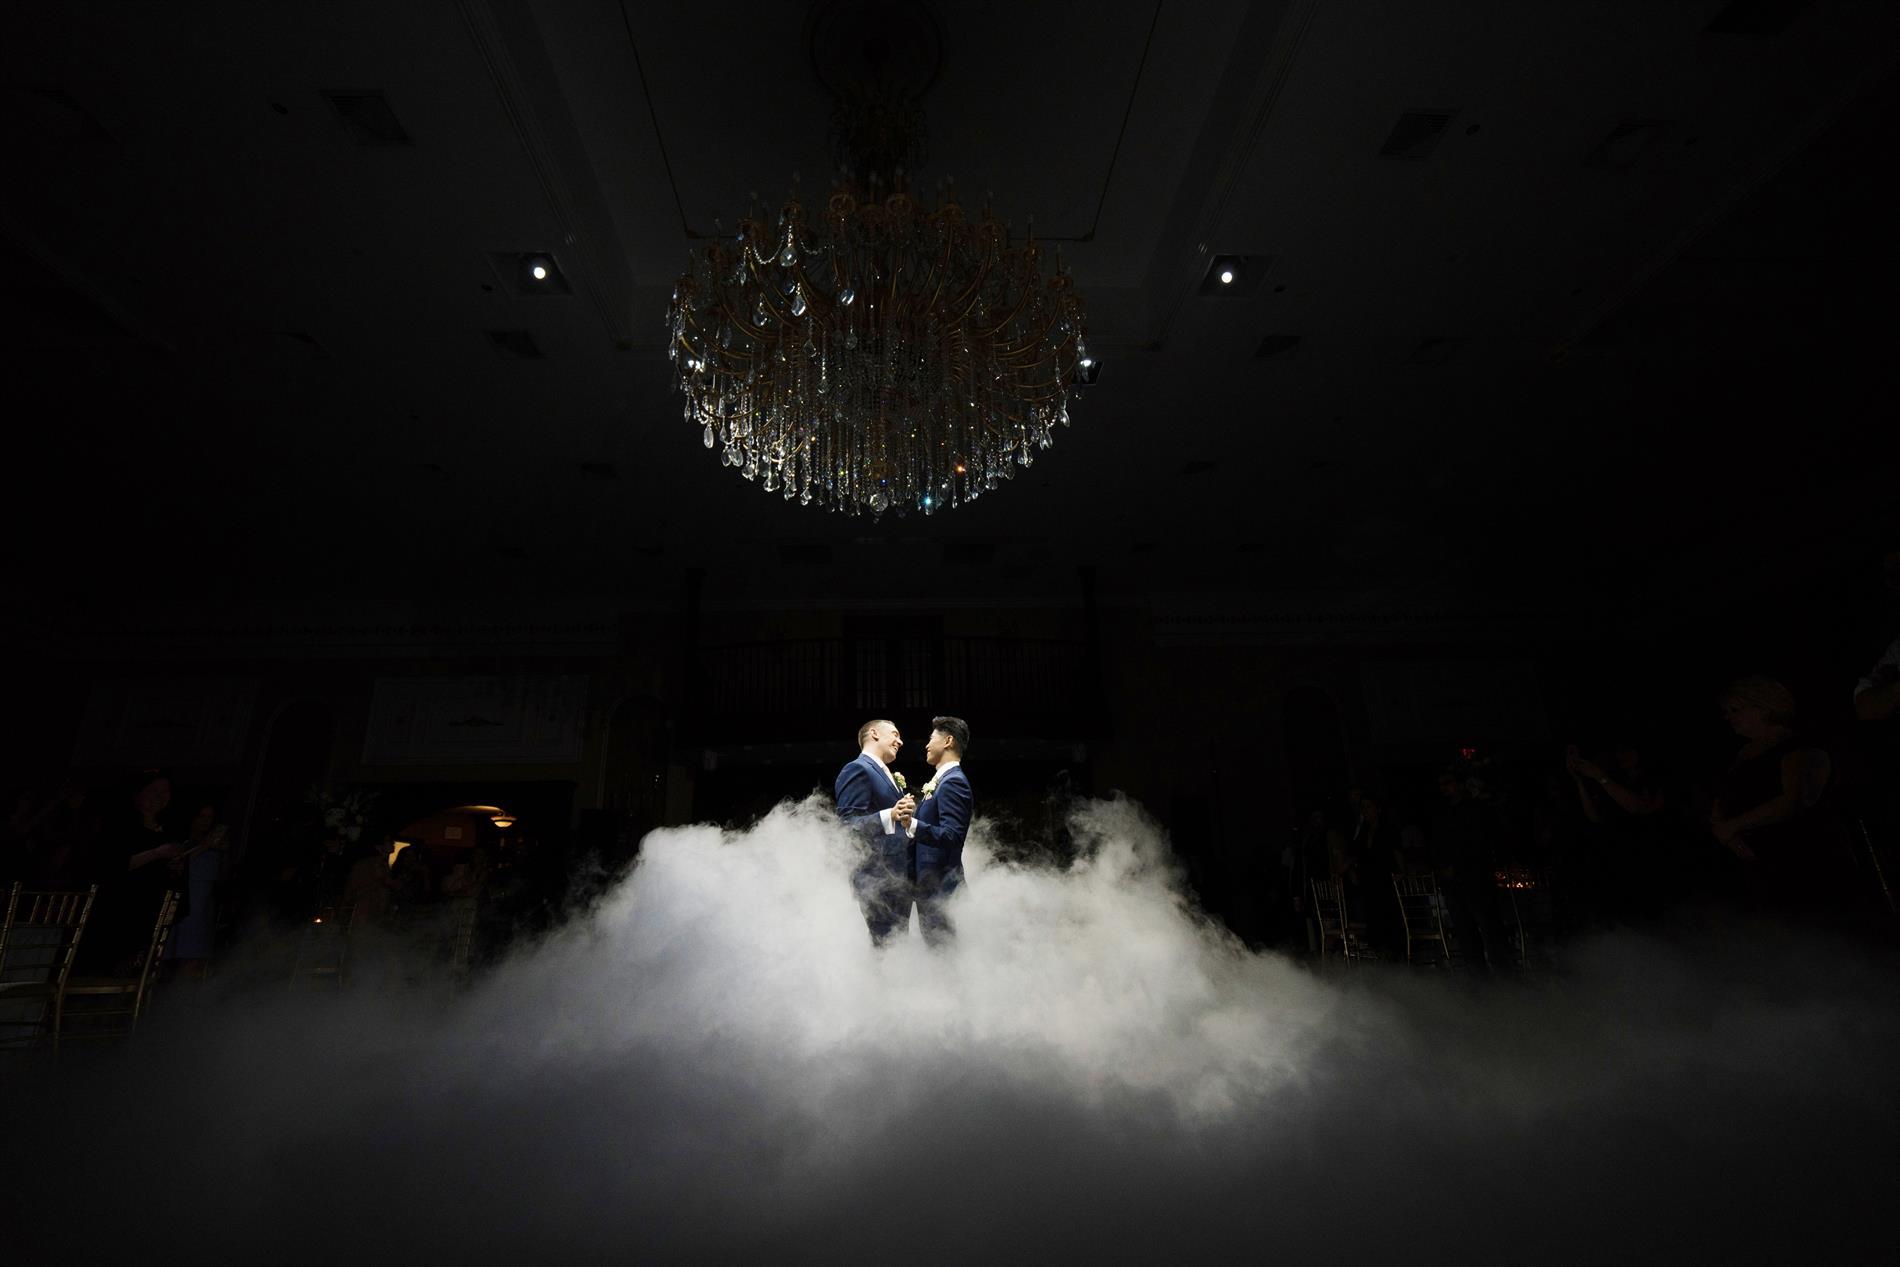 Alvin & Charles Wedding Photos